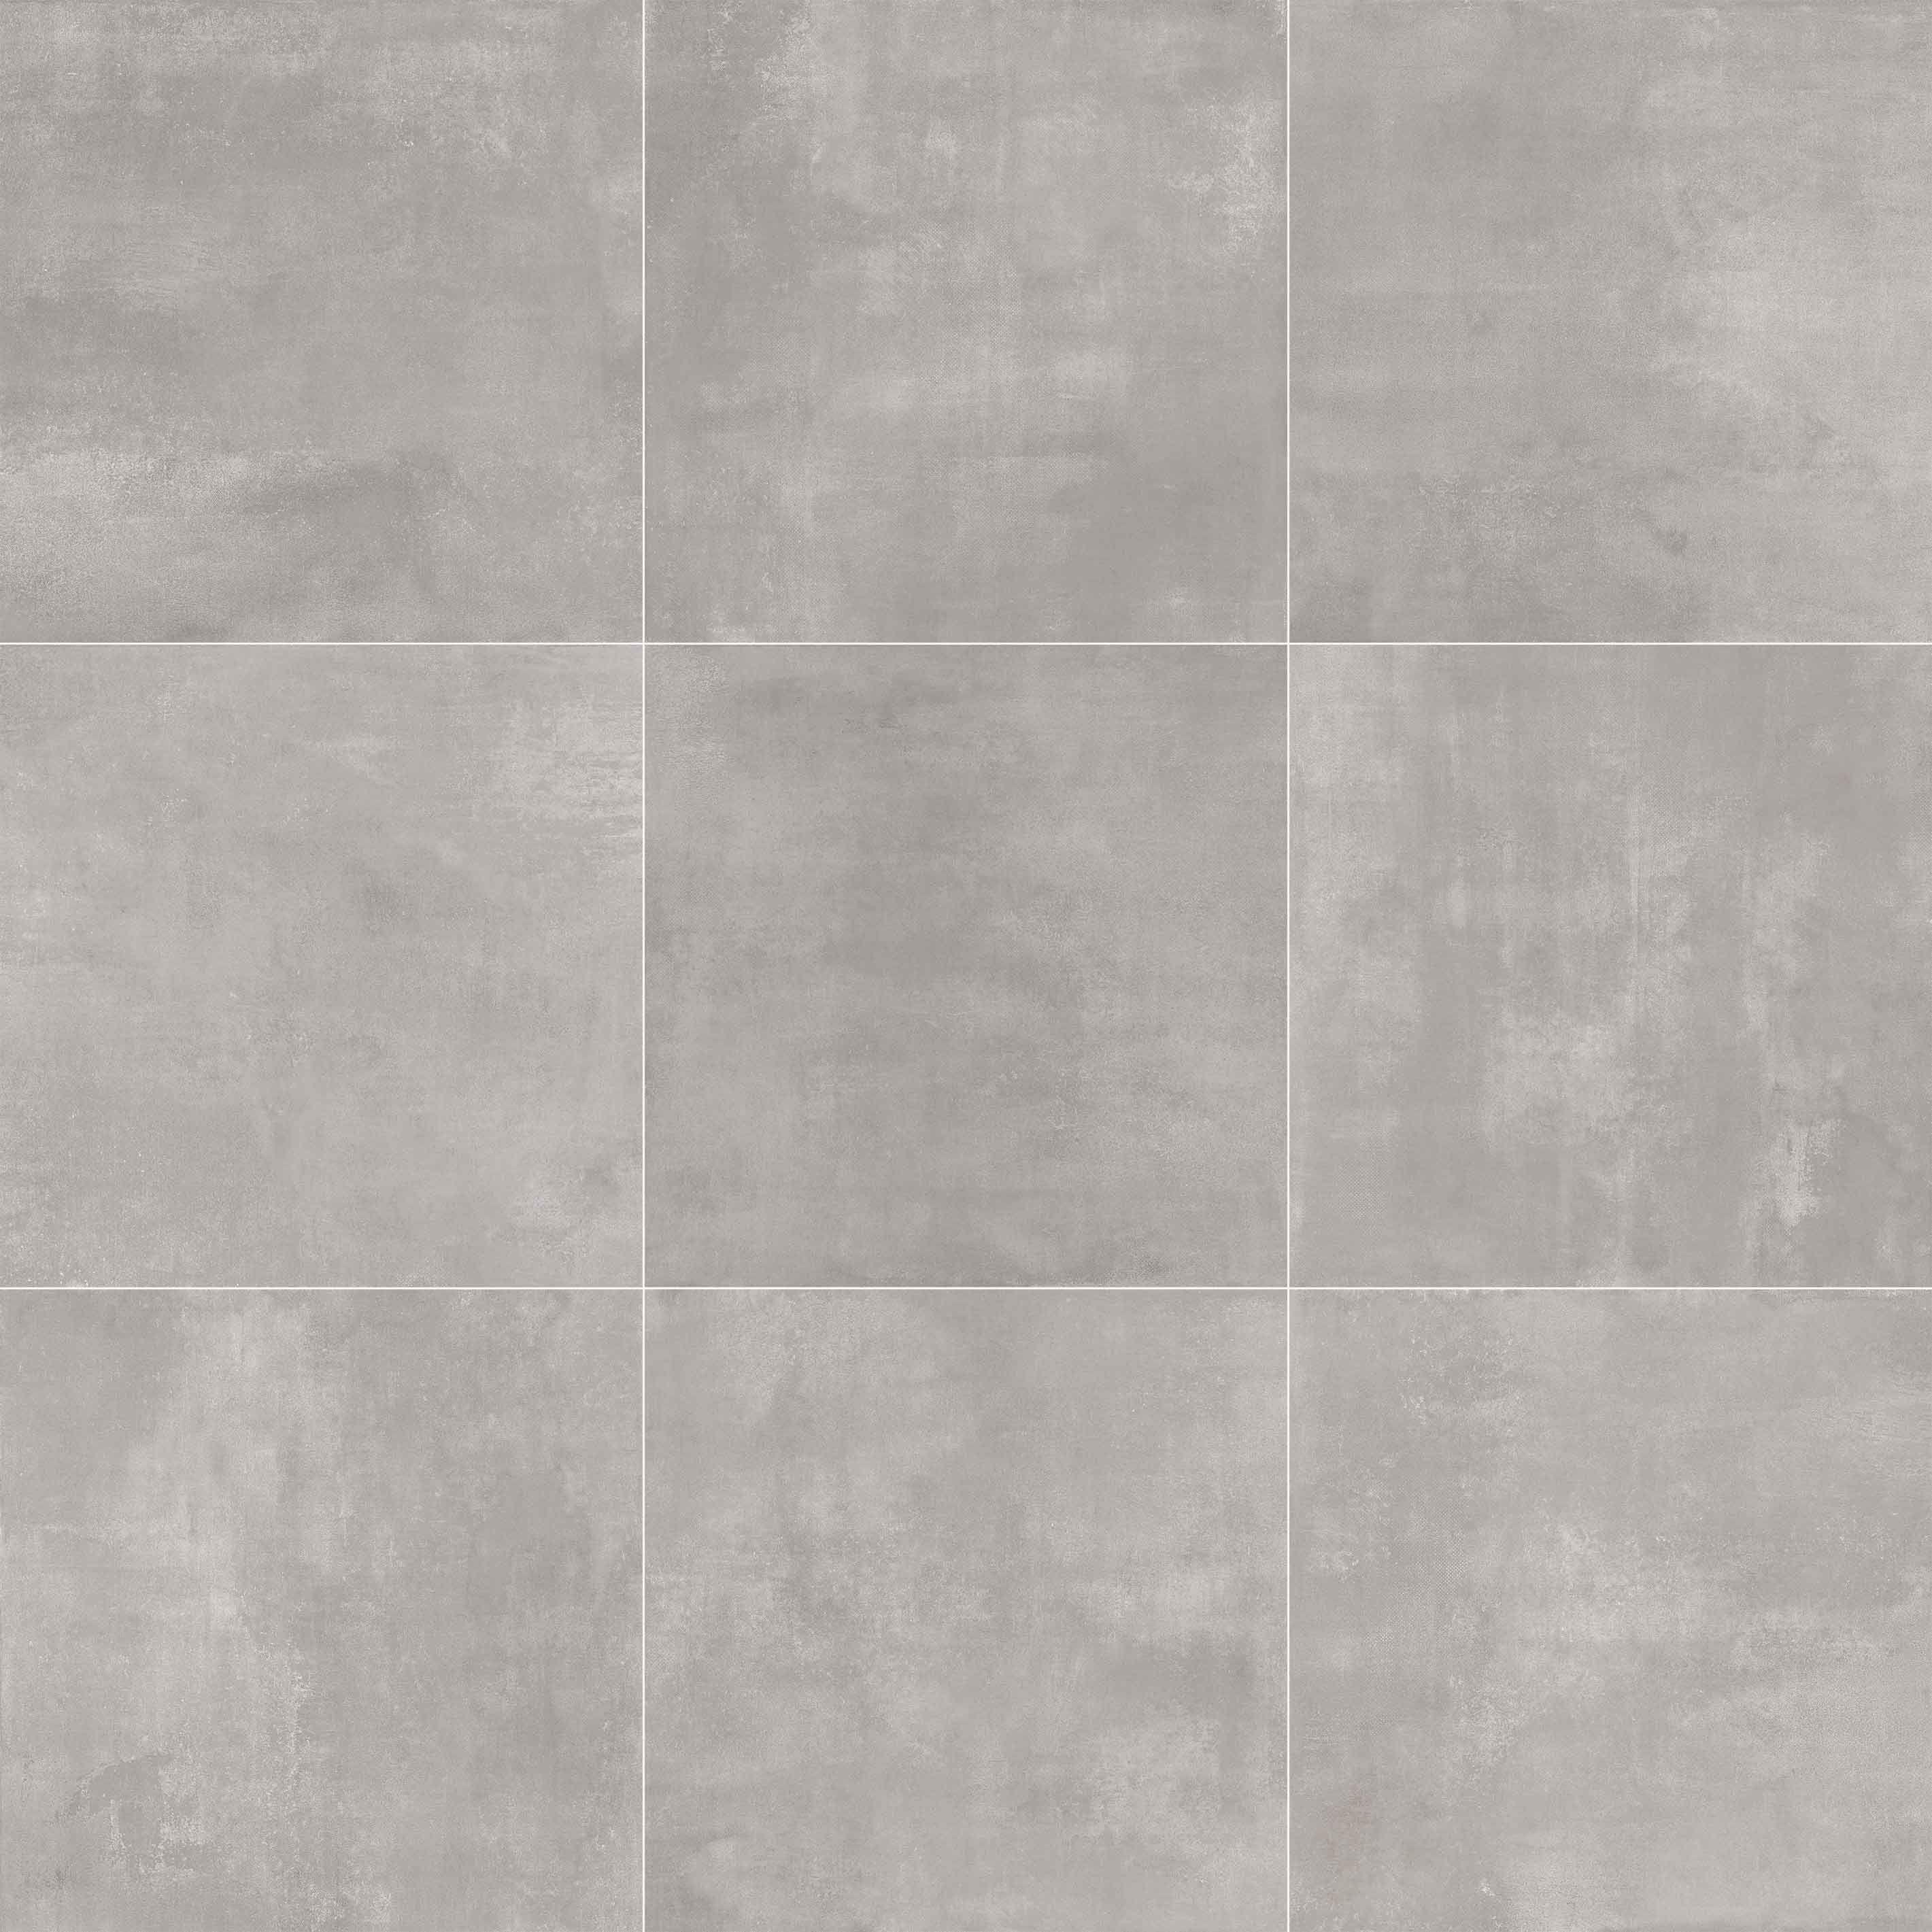 Industrial Style Porcelain Floor Tiles Porcelain Floor Tiles